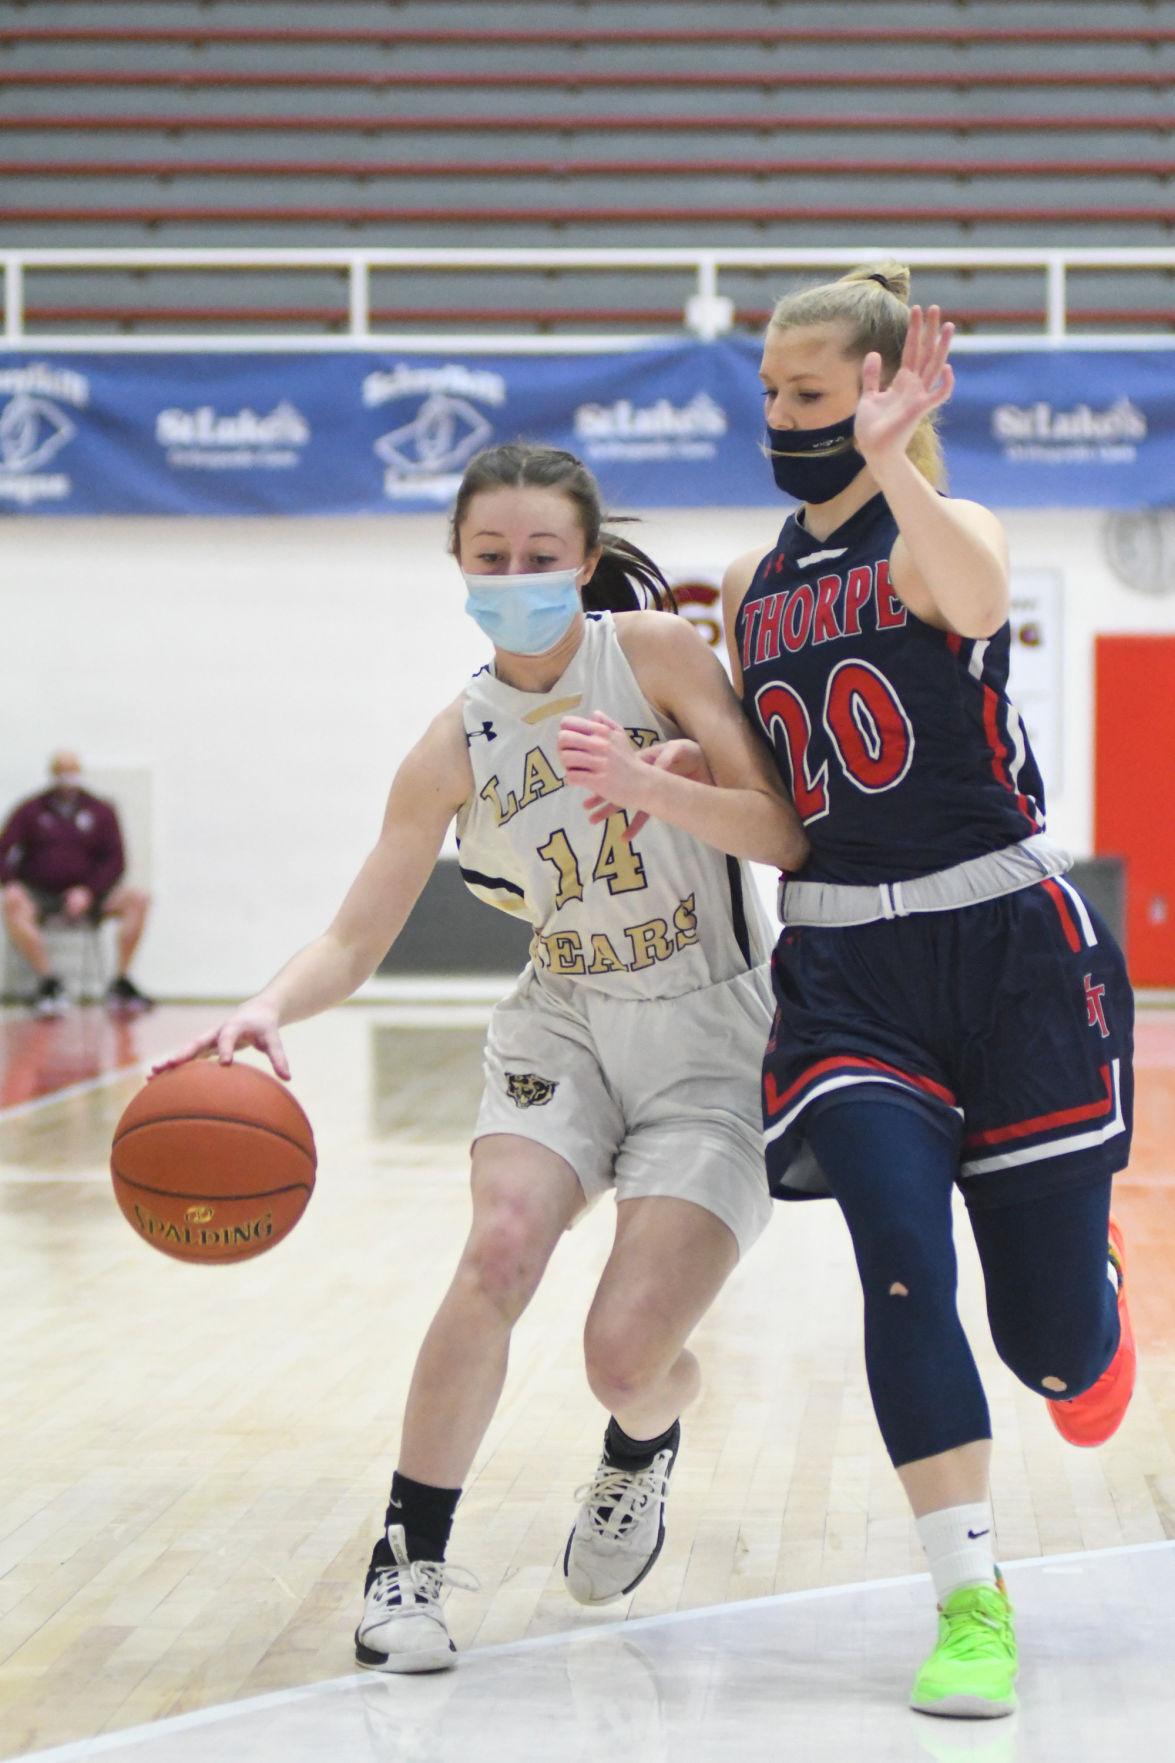 Dubosky, Clark named to All-State Girls Basketball Team